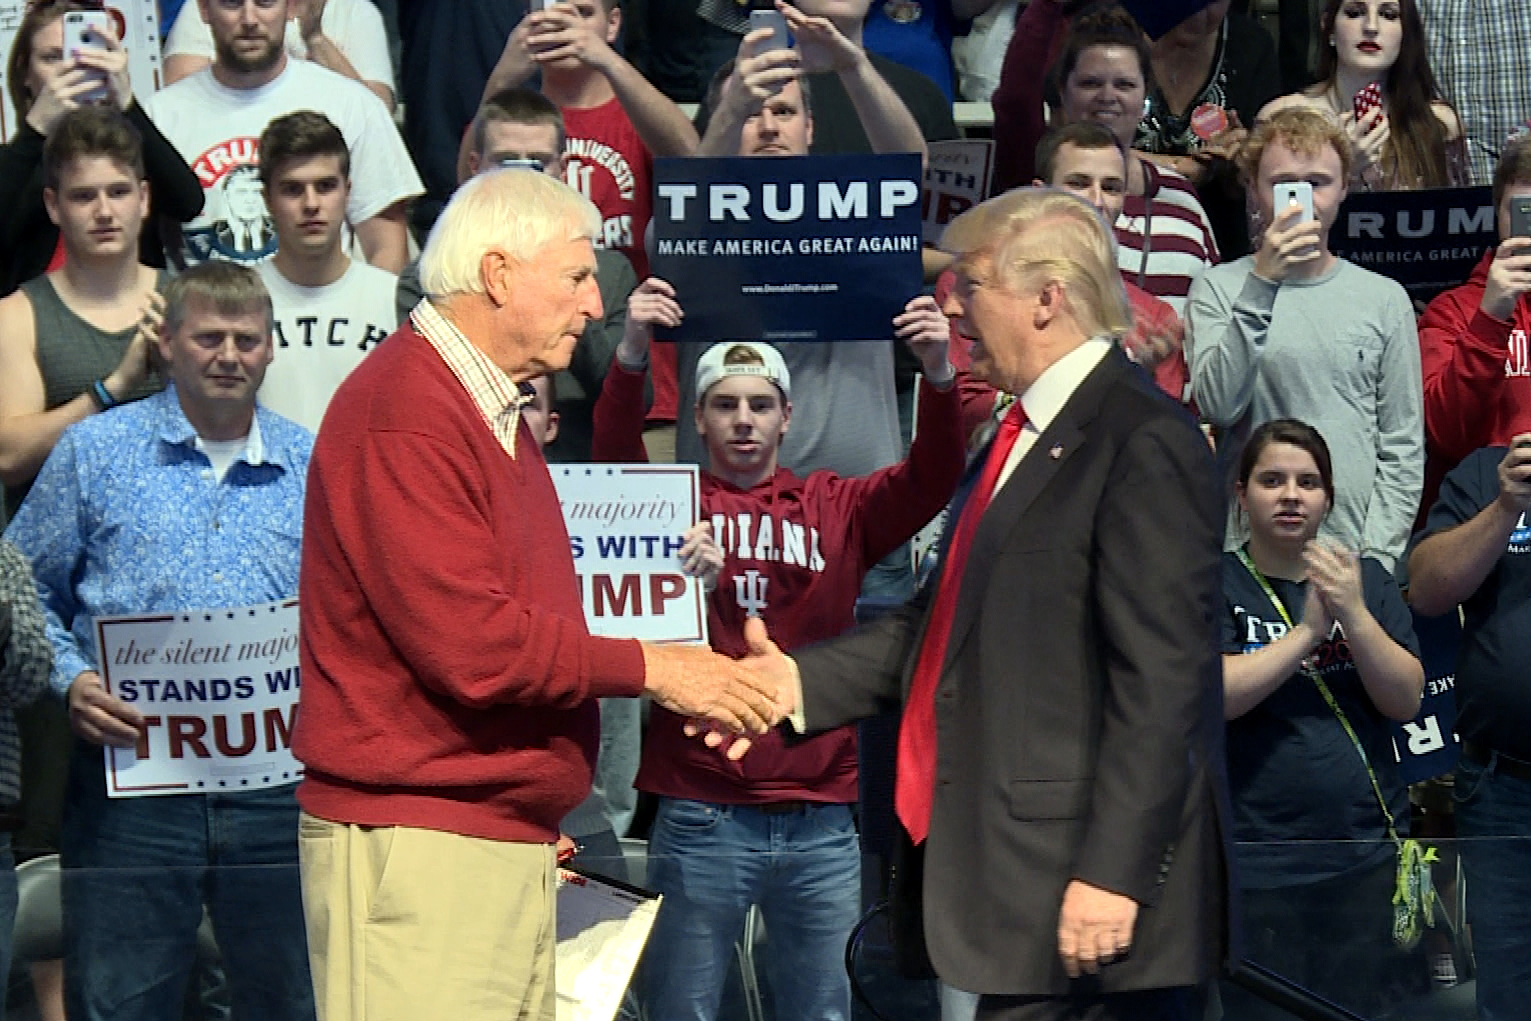 Bobby Knight and Donald Trump